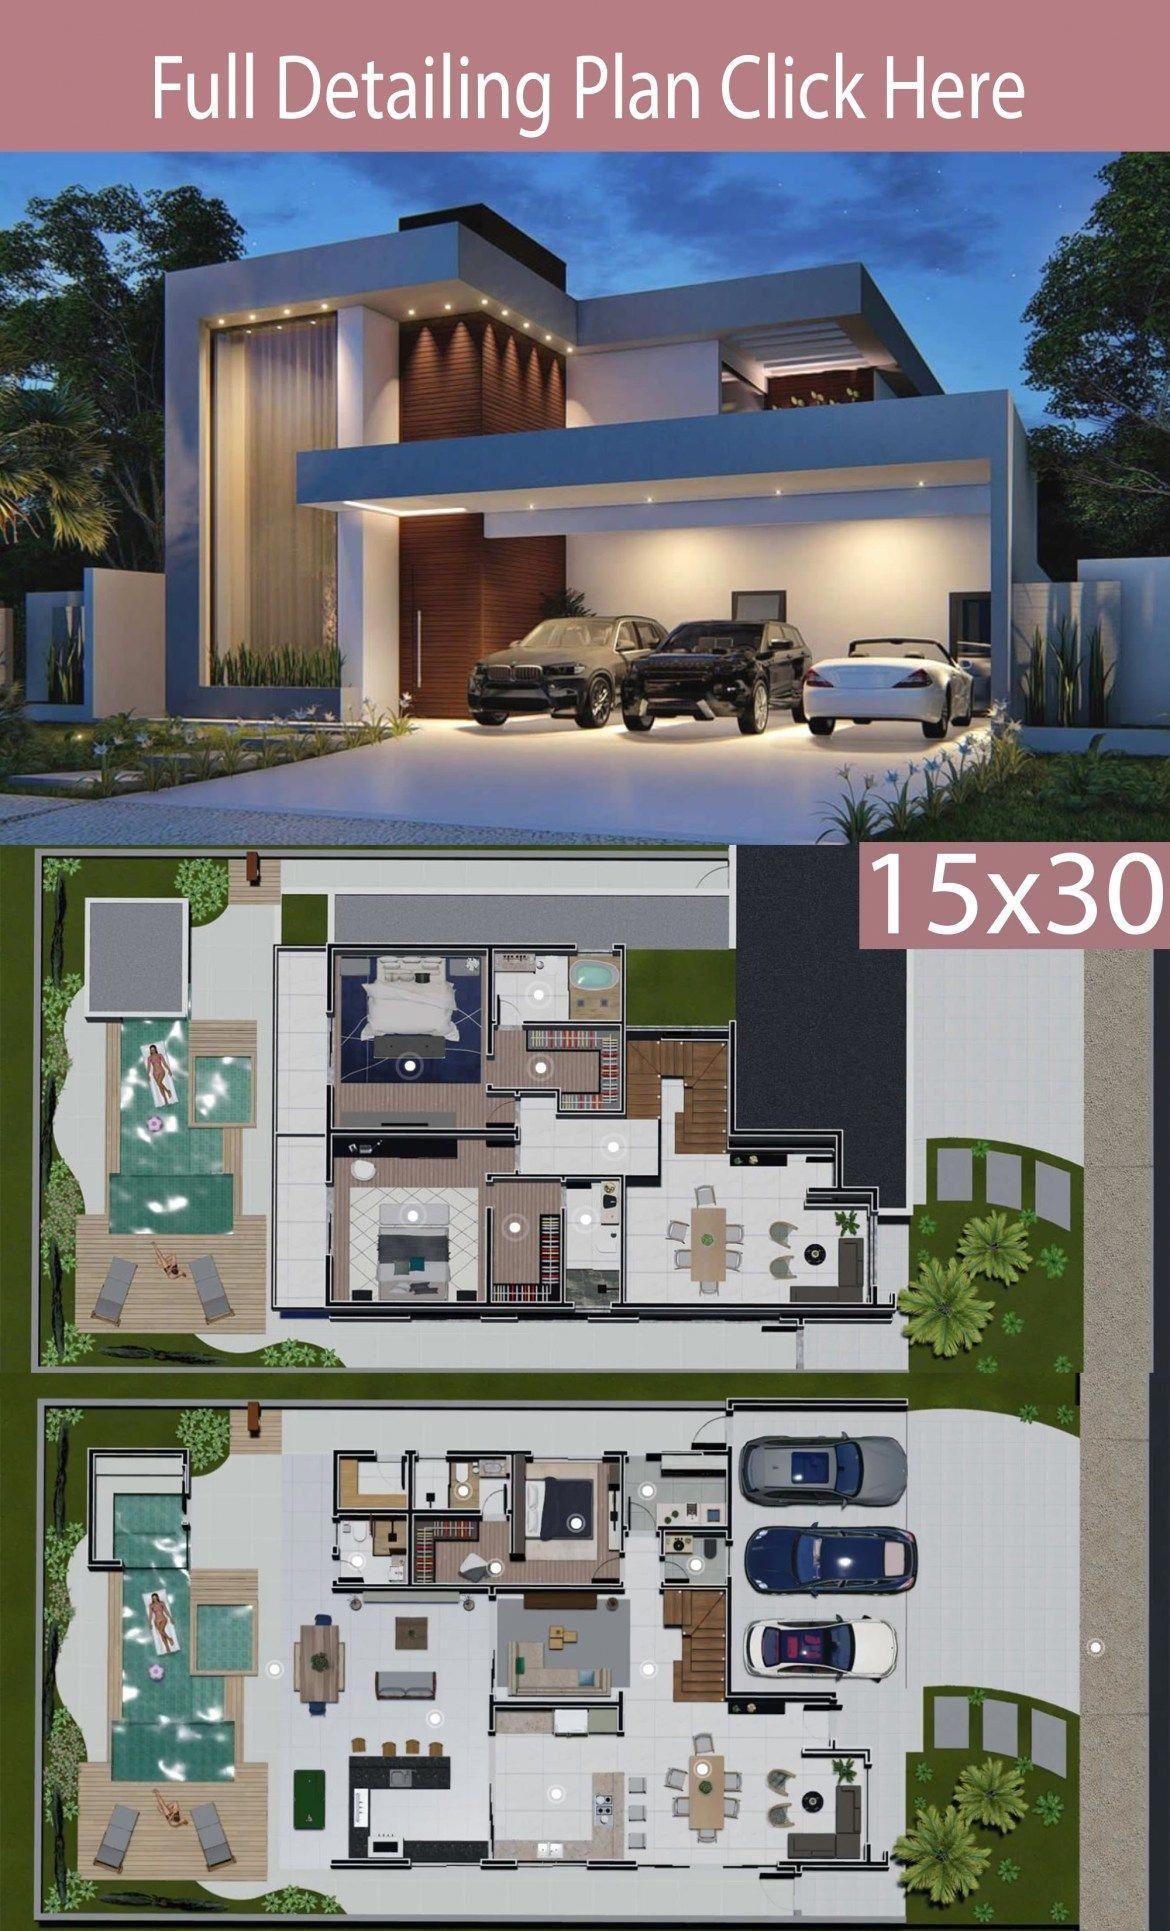 Modern Home Design Photos 2021 In 2020 Home Design Floor Plans Modern House Floor Plans Architectural House Plans